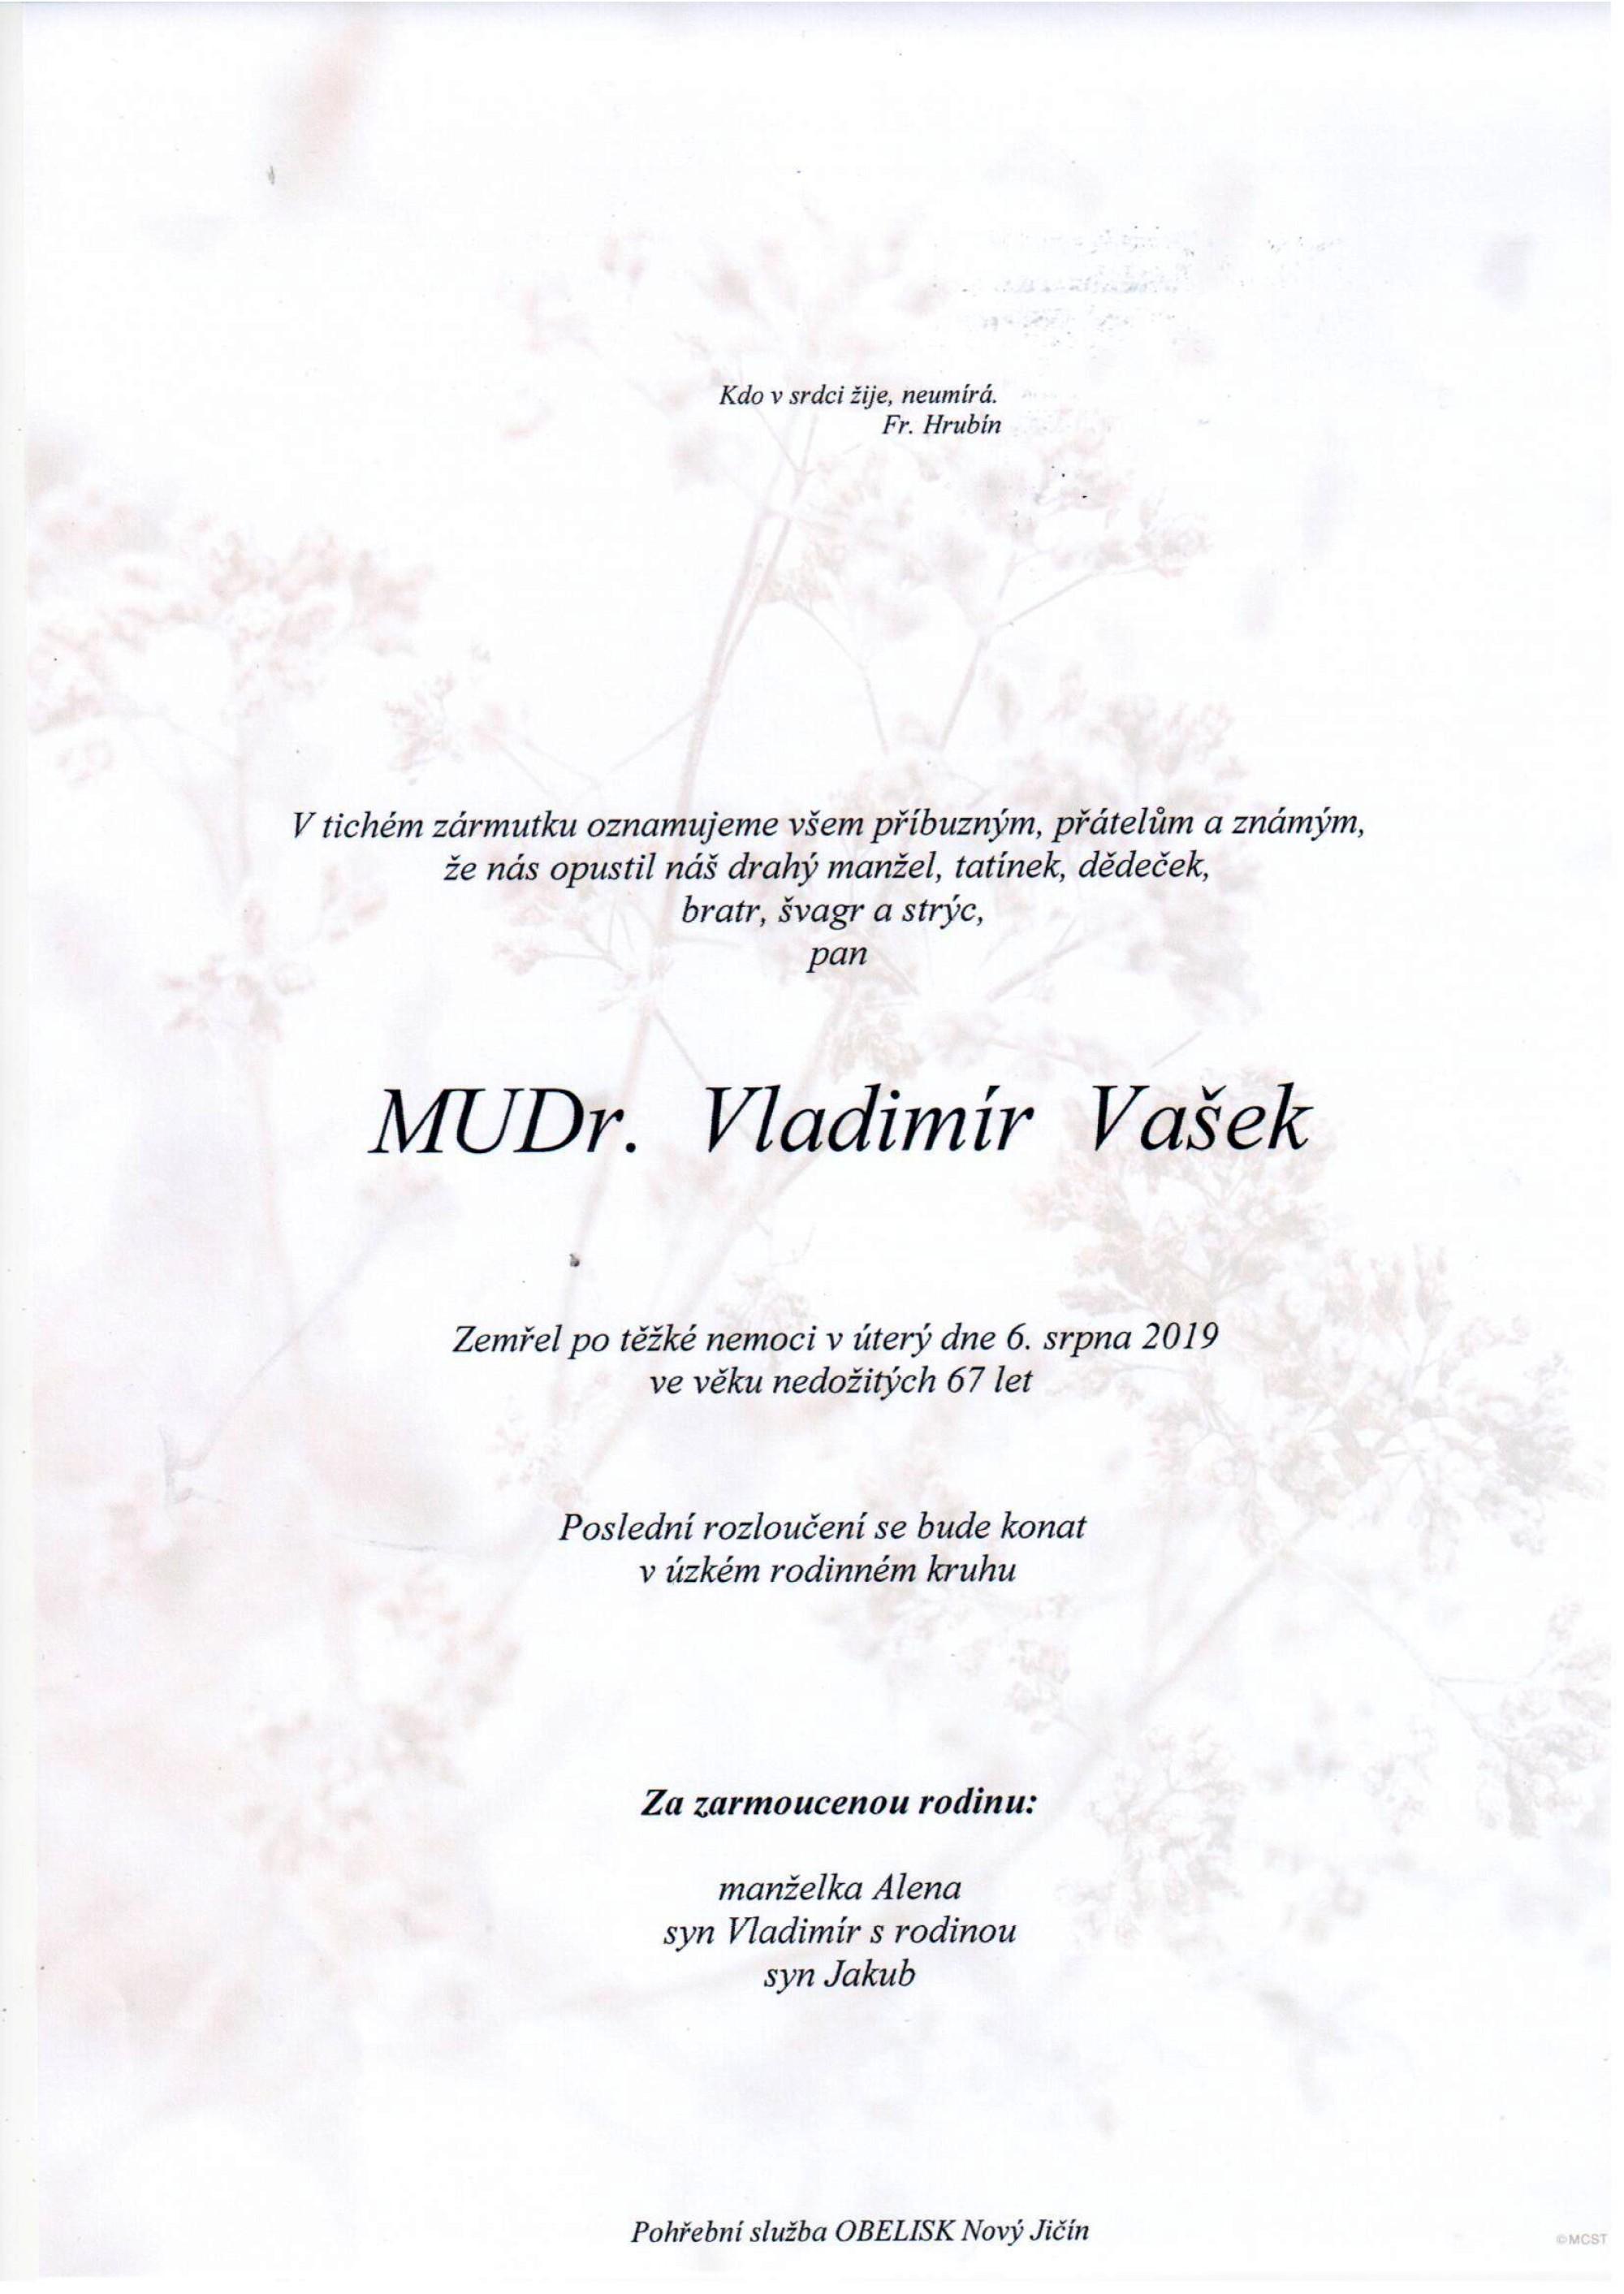 MUDr. Vladimír Vašek